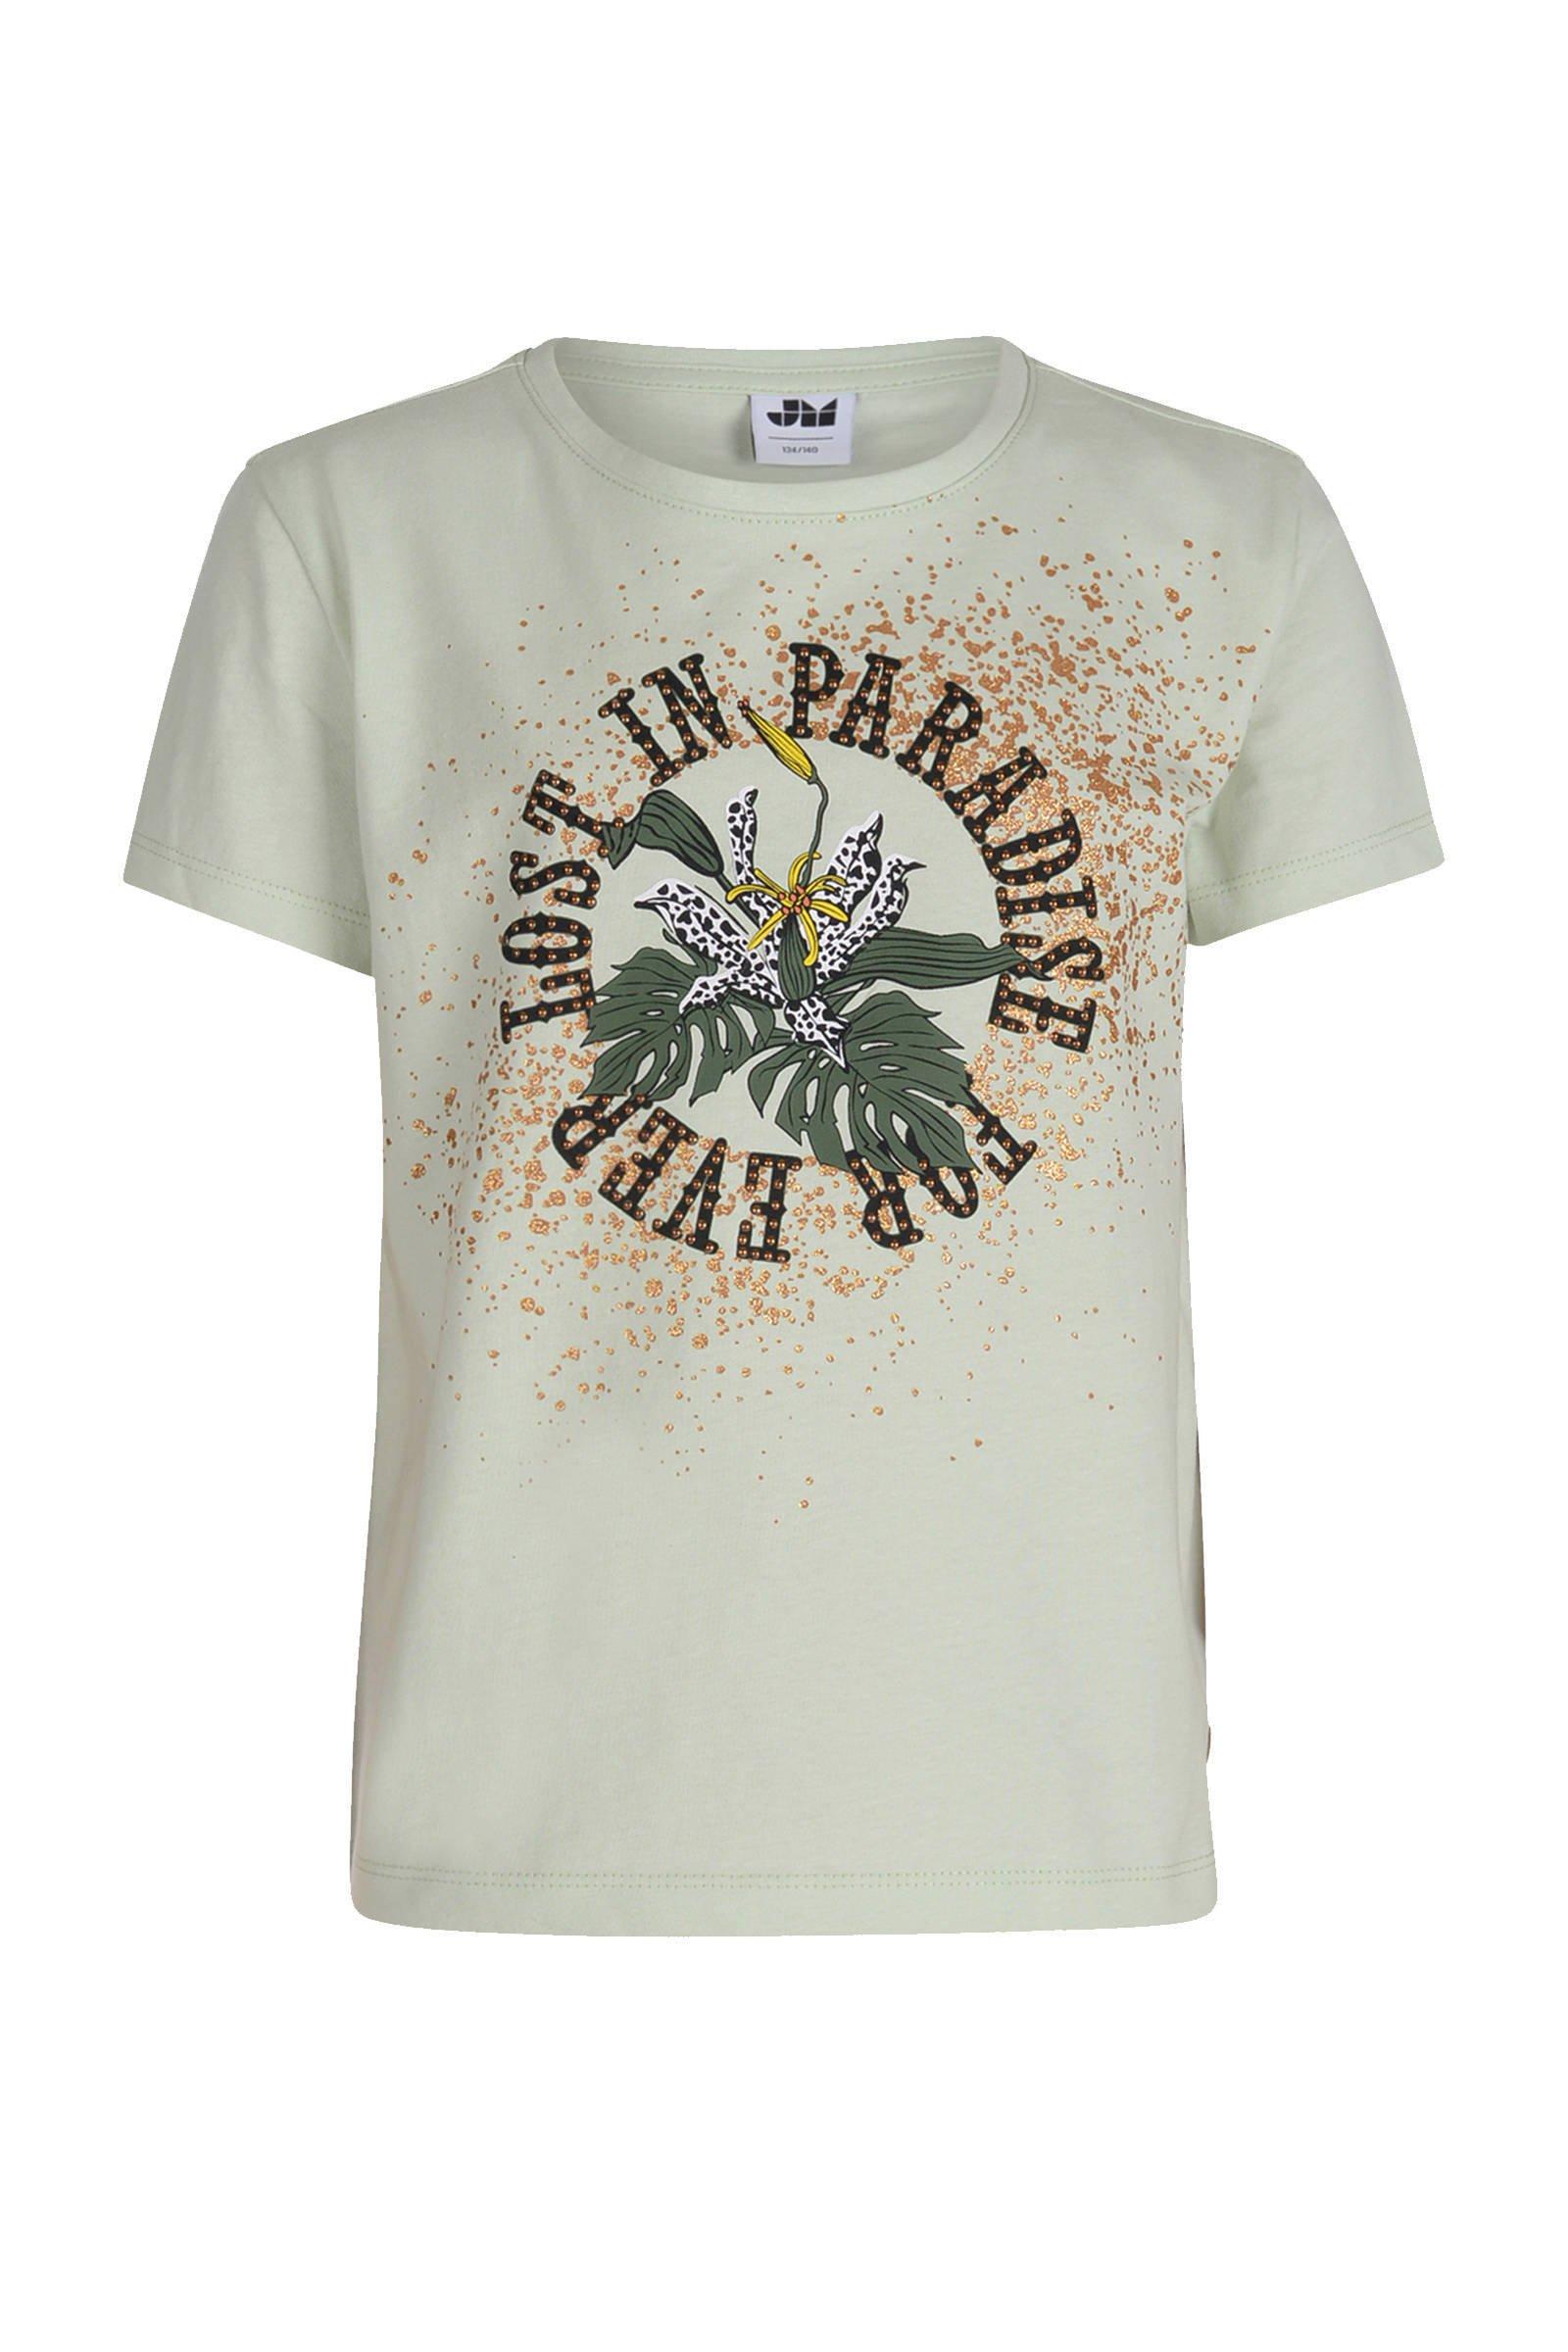 Jill & Mitch by Shoeby T-shirt Harmony met printopdruk lichtgroen/oranje - maat 146/152